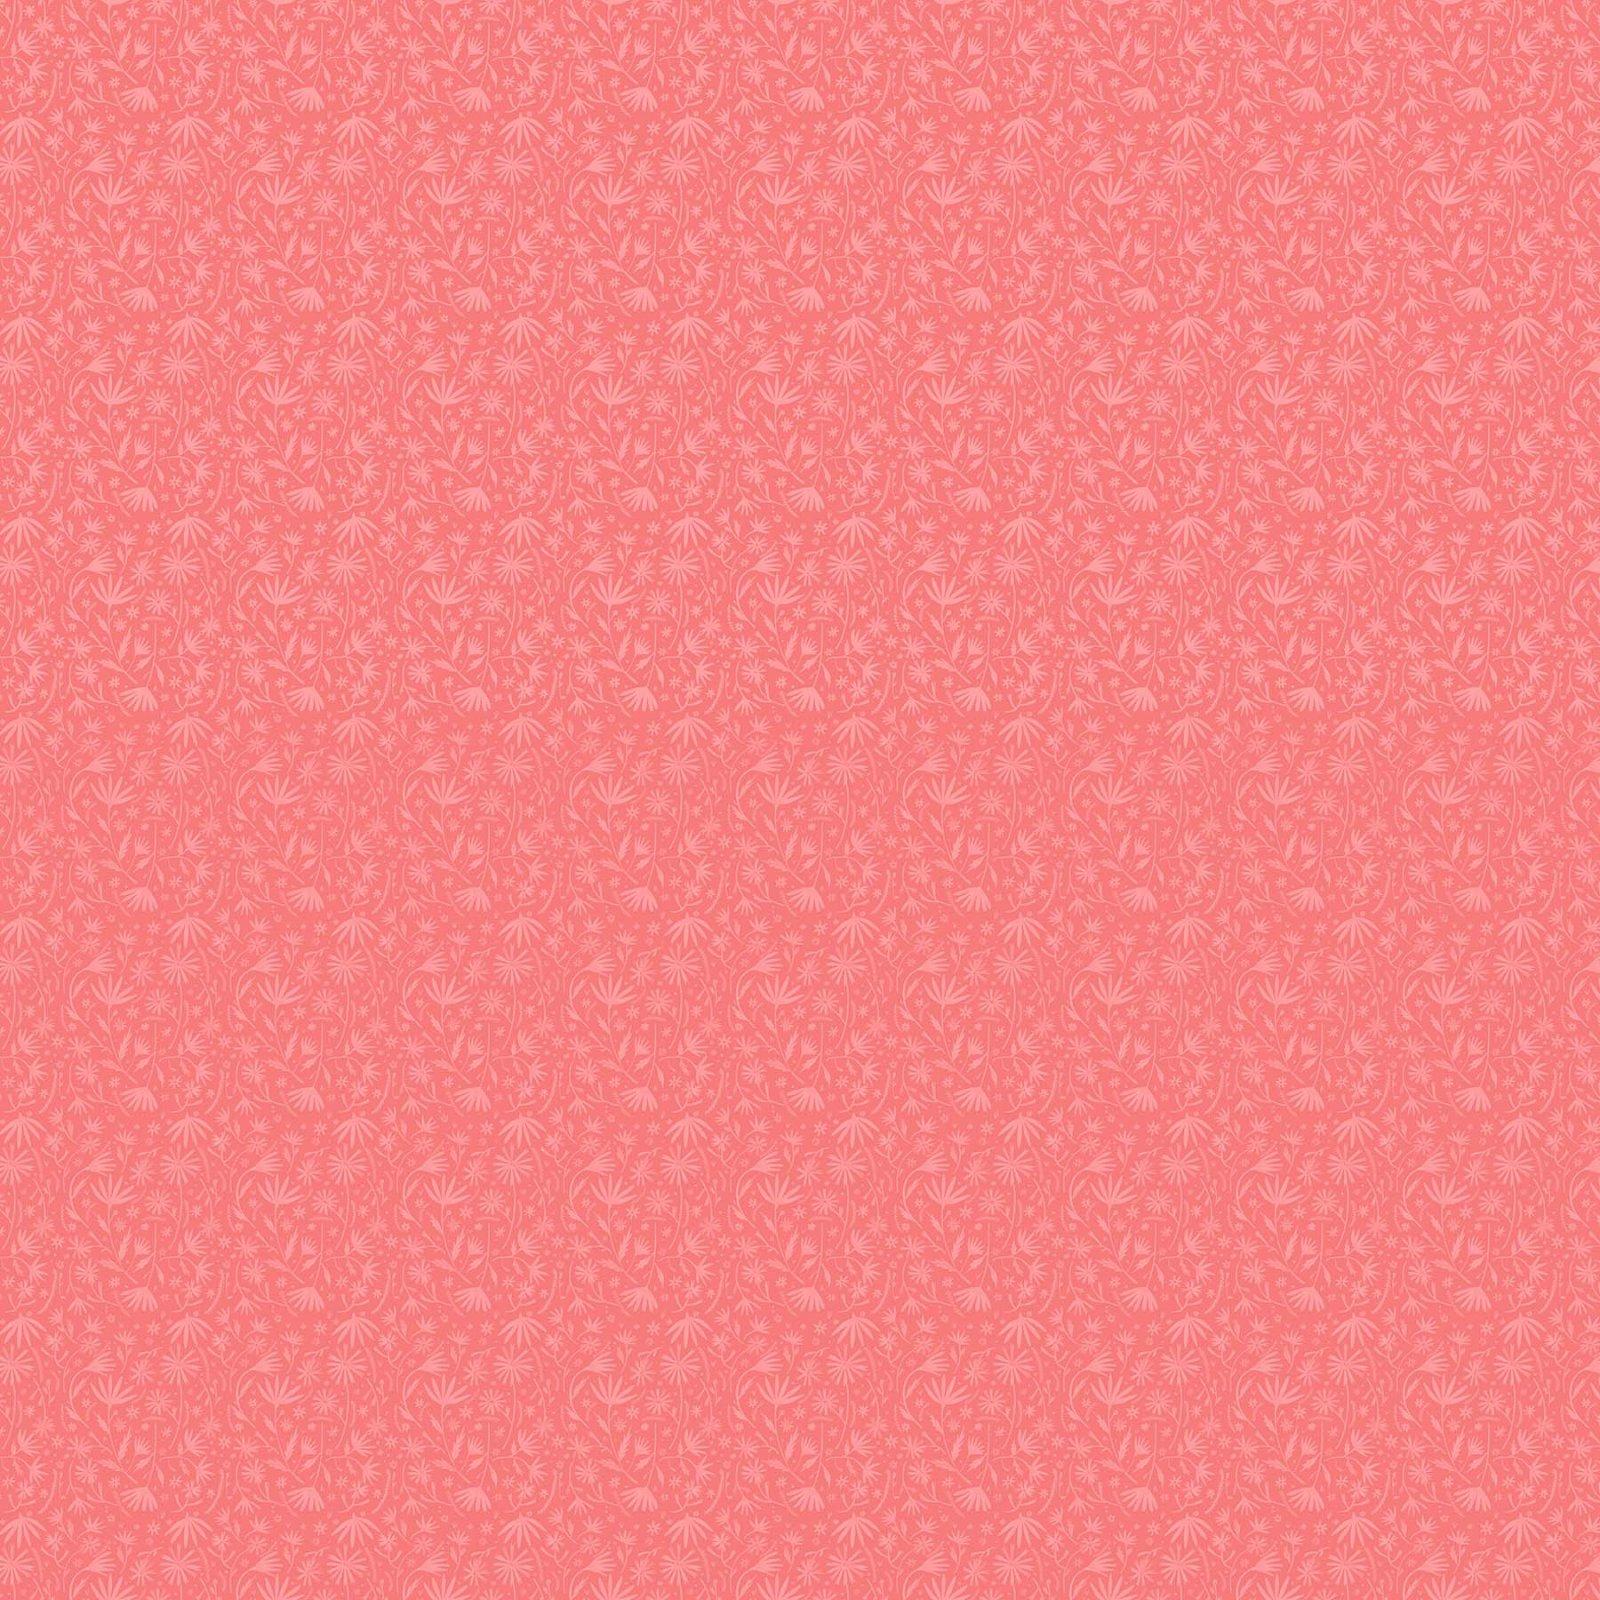 Abigail Halpin Eloise's Garden Pink tonal flower